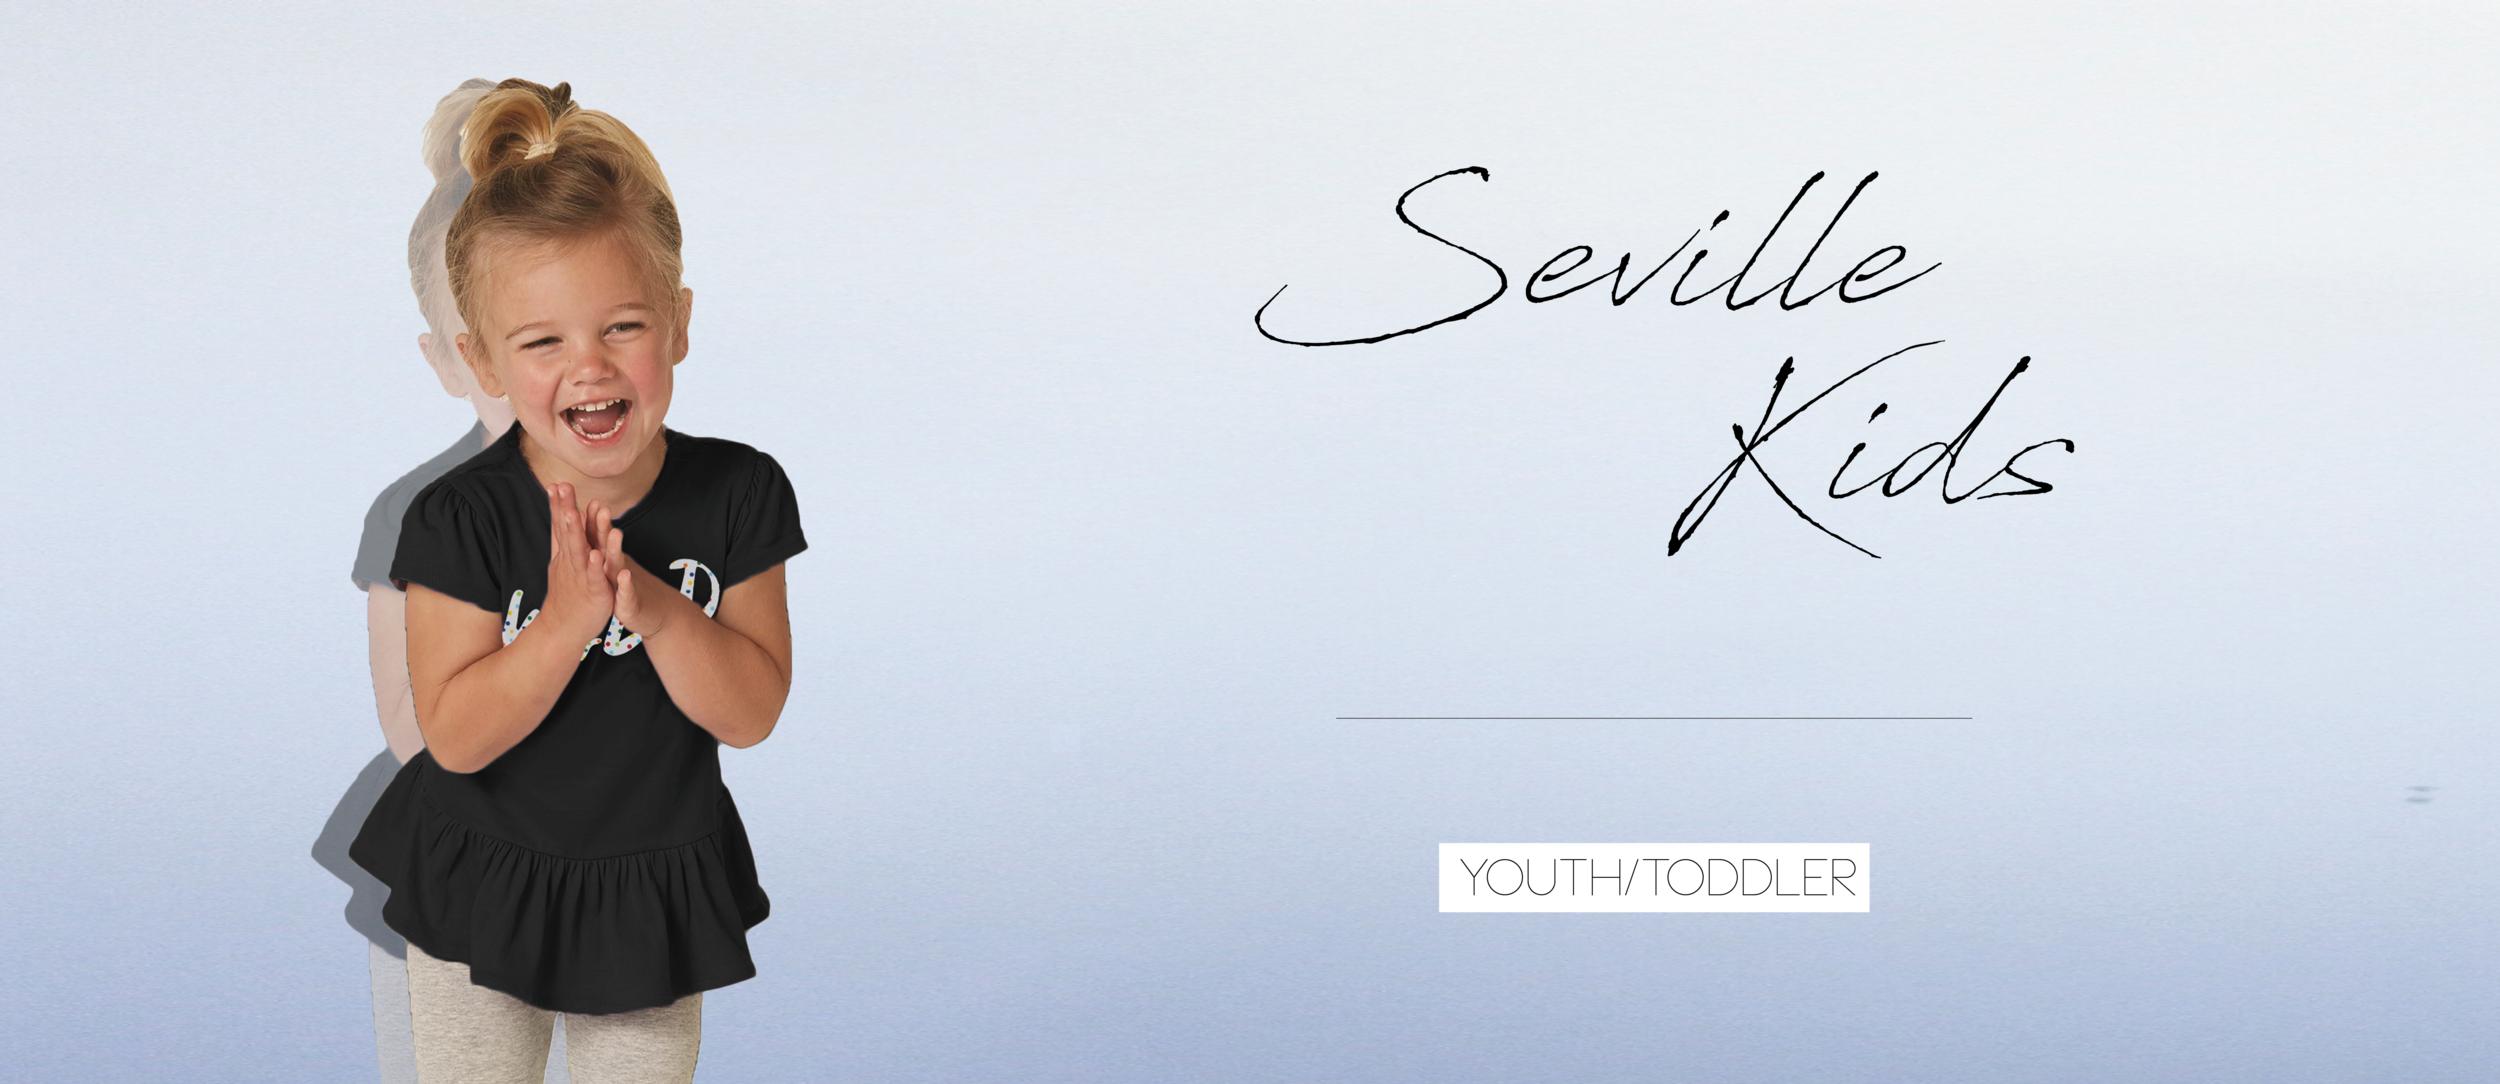 youthtoddler-01.png